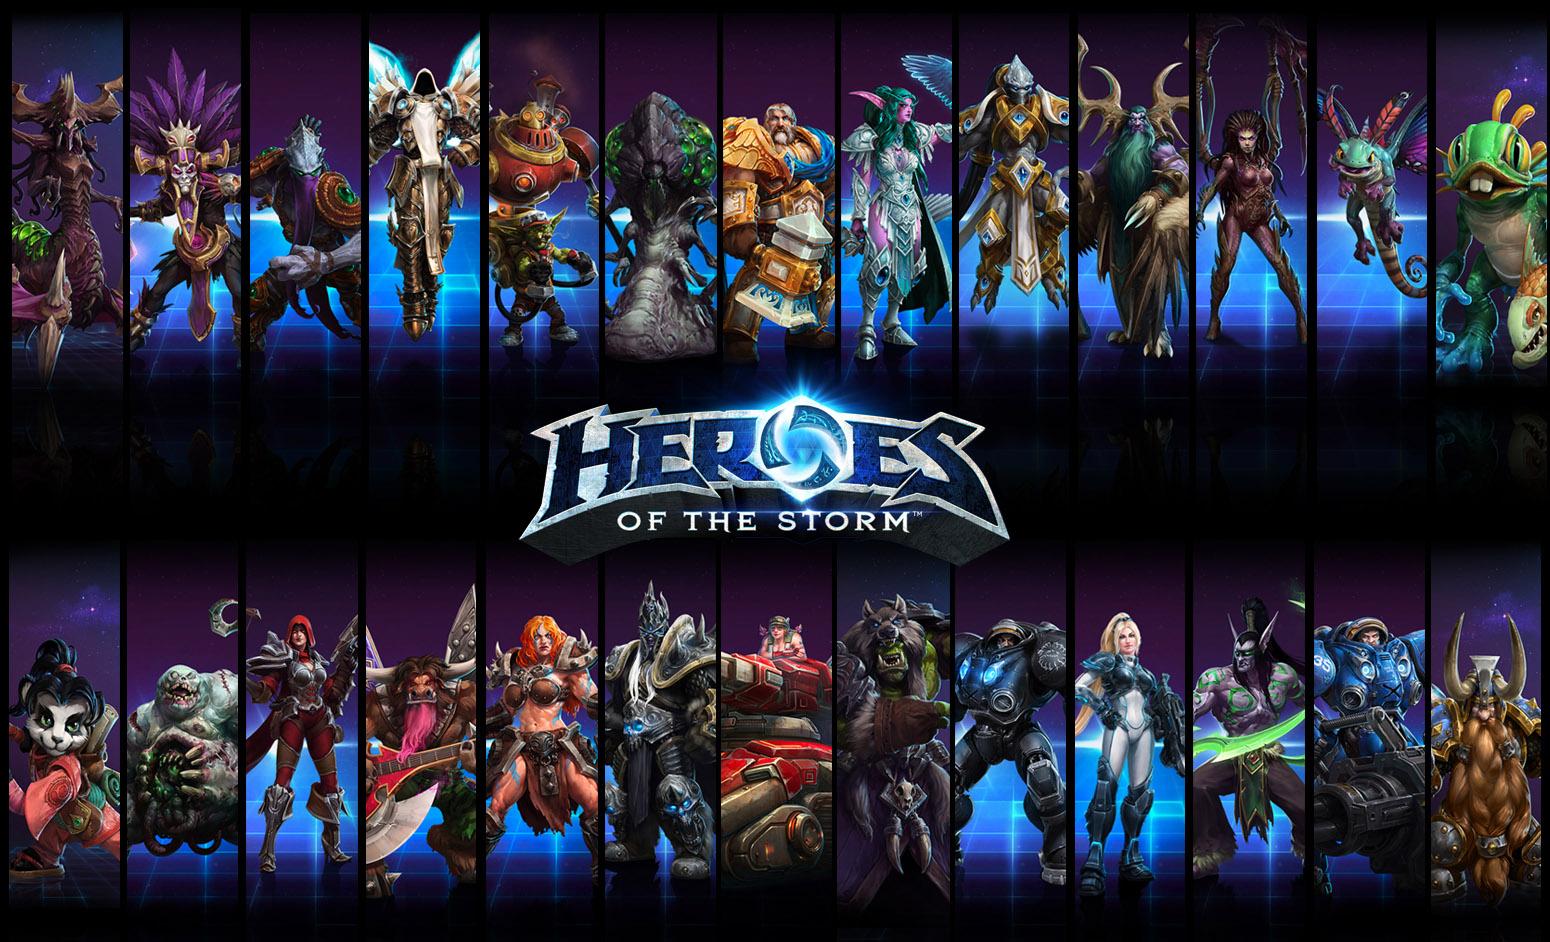 heroes_of_the_storm___heroes_wallpaper_1920x1080